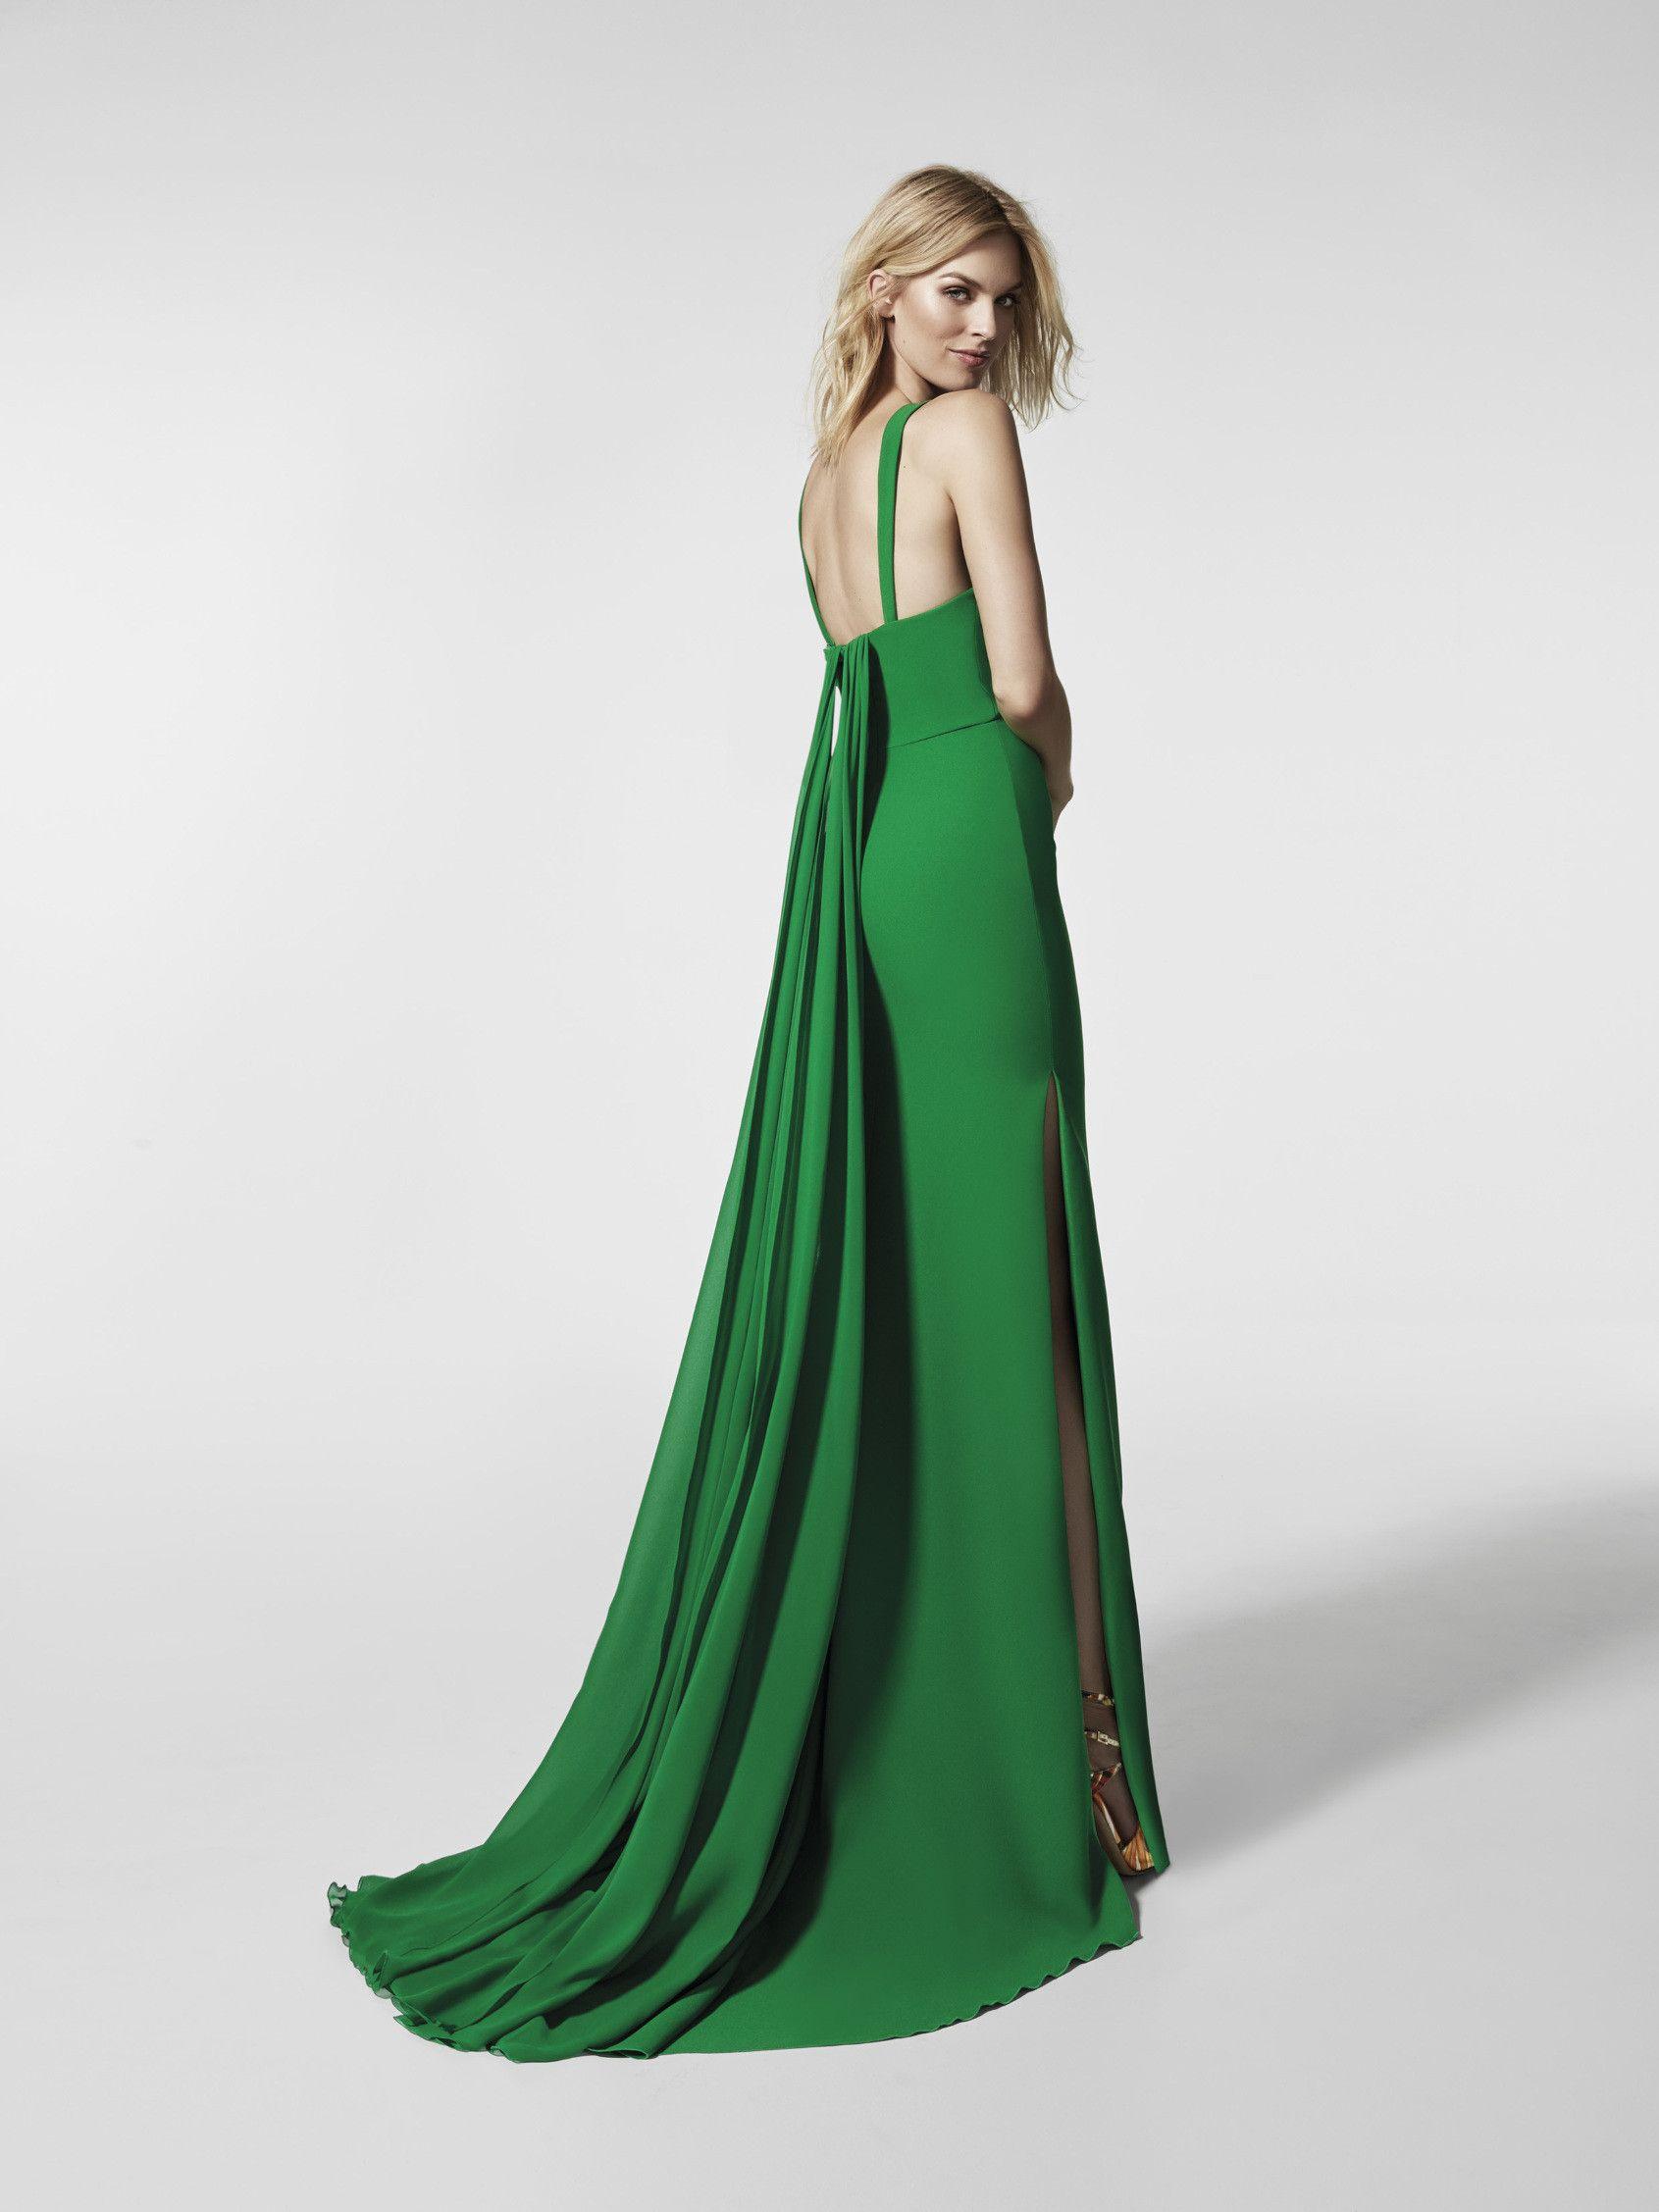 e3b0dfc36 Imagen del vestido de fiesta verde (62025). Vestido GRESAL largo sin mangas